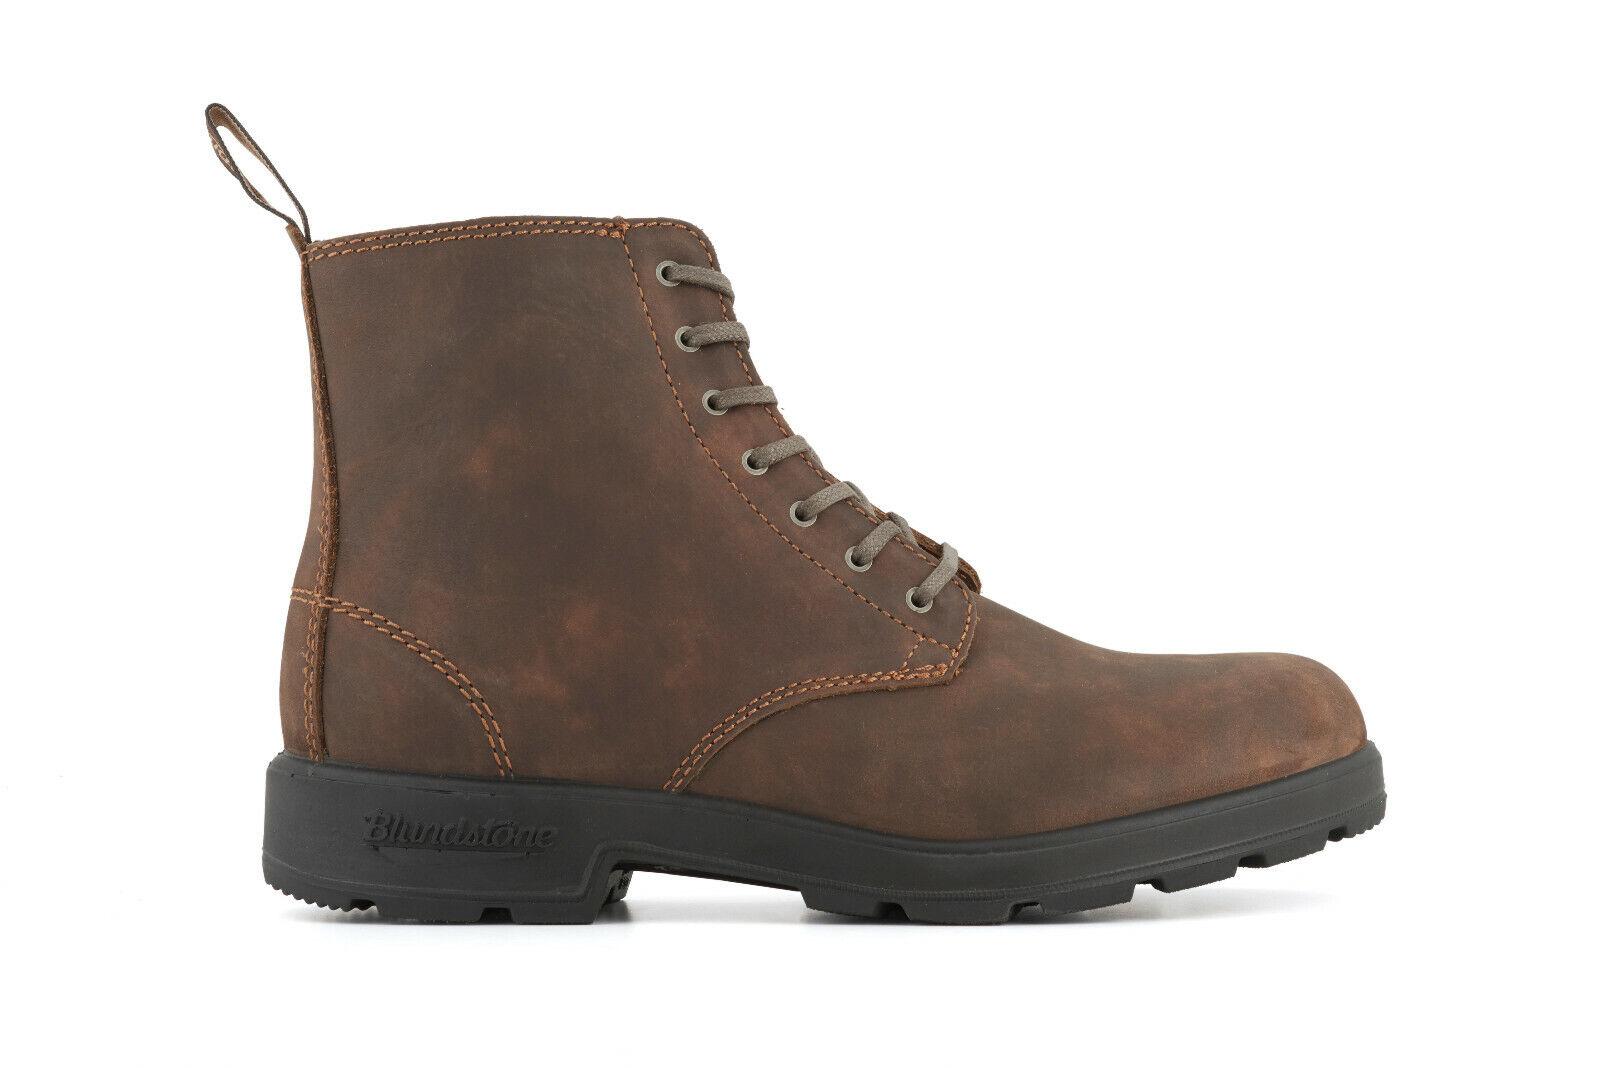 bluendstone 1450 Rustikal brownes Leder Unisex Schnür Stiefel Chelsea